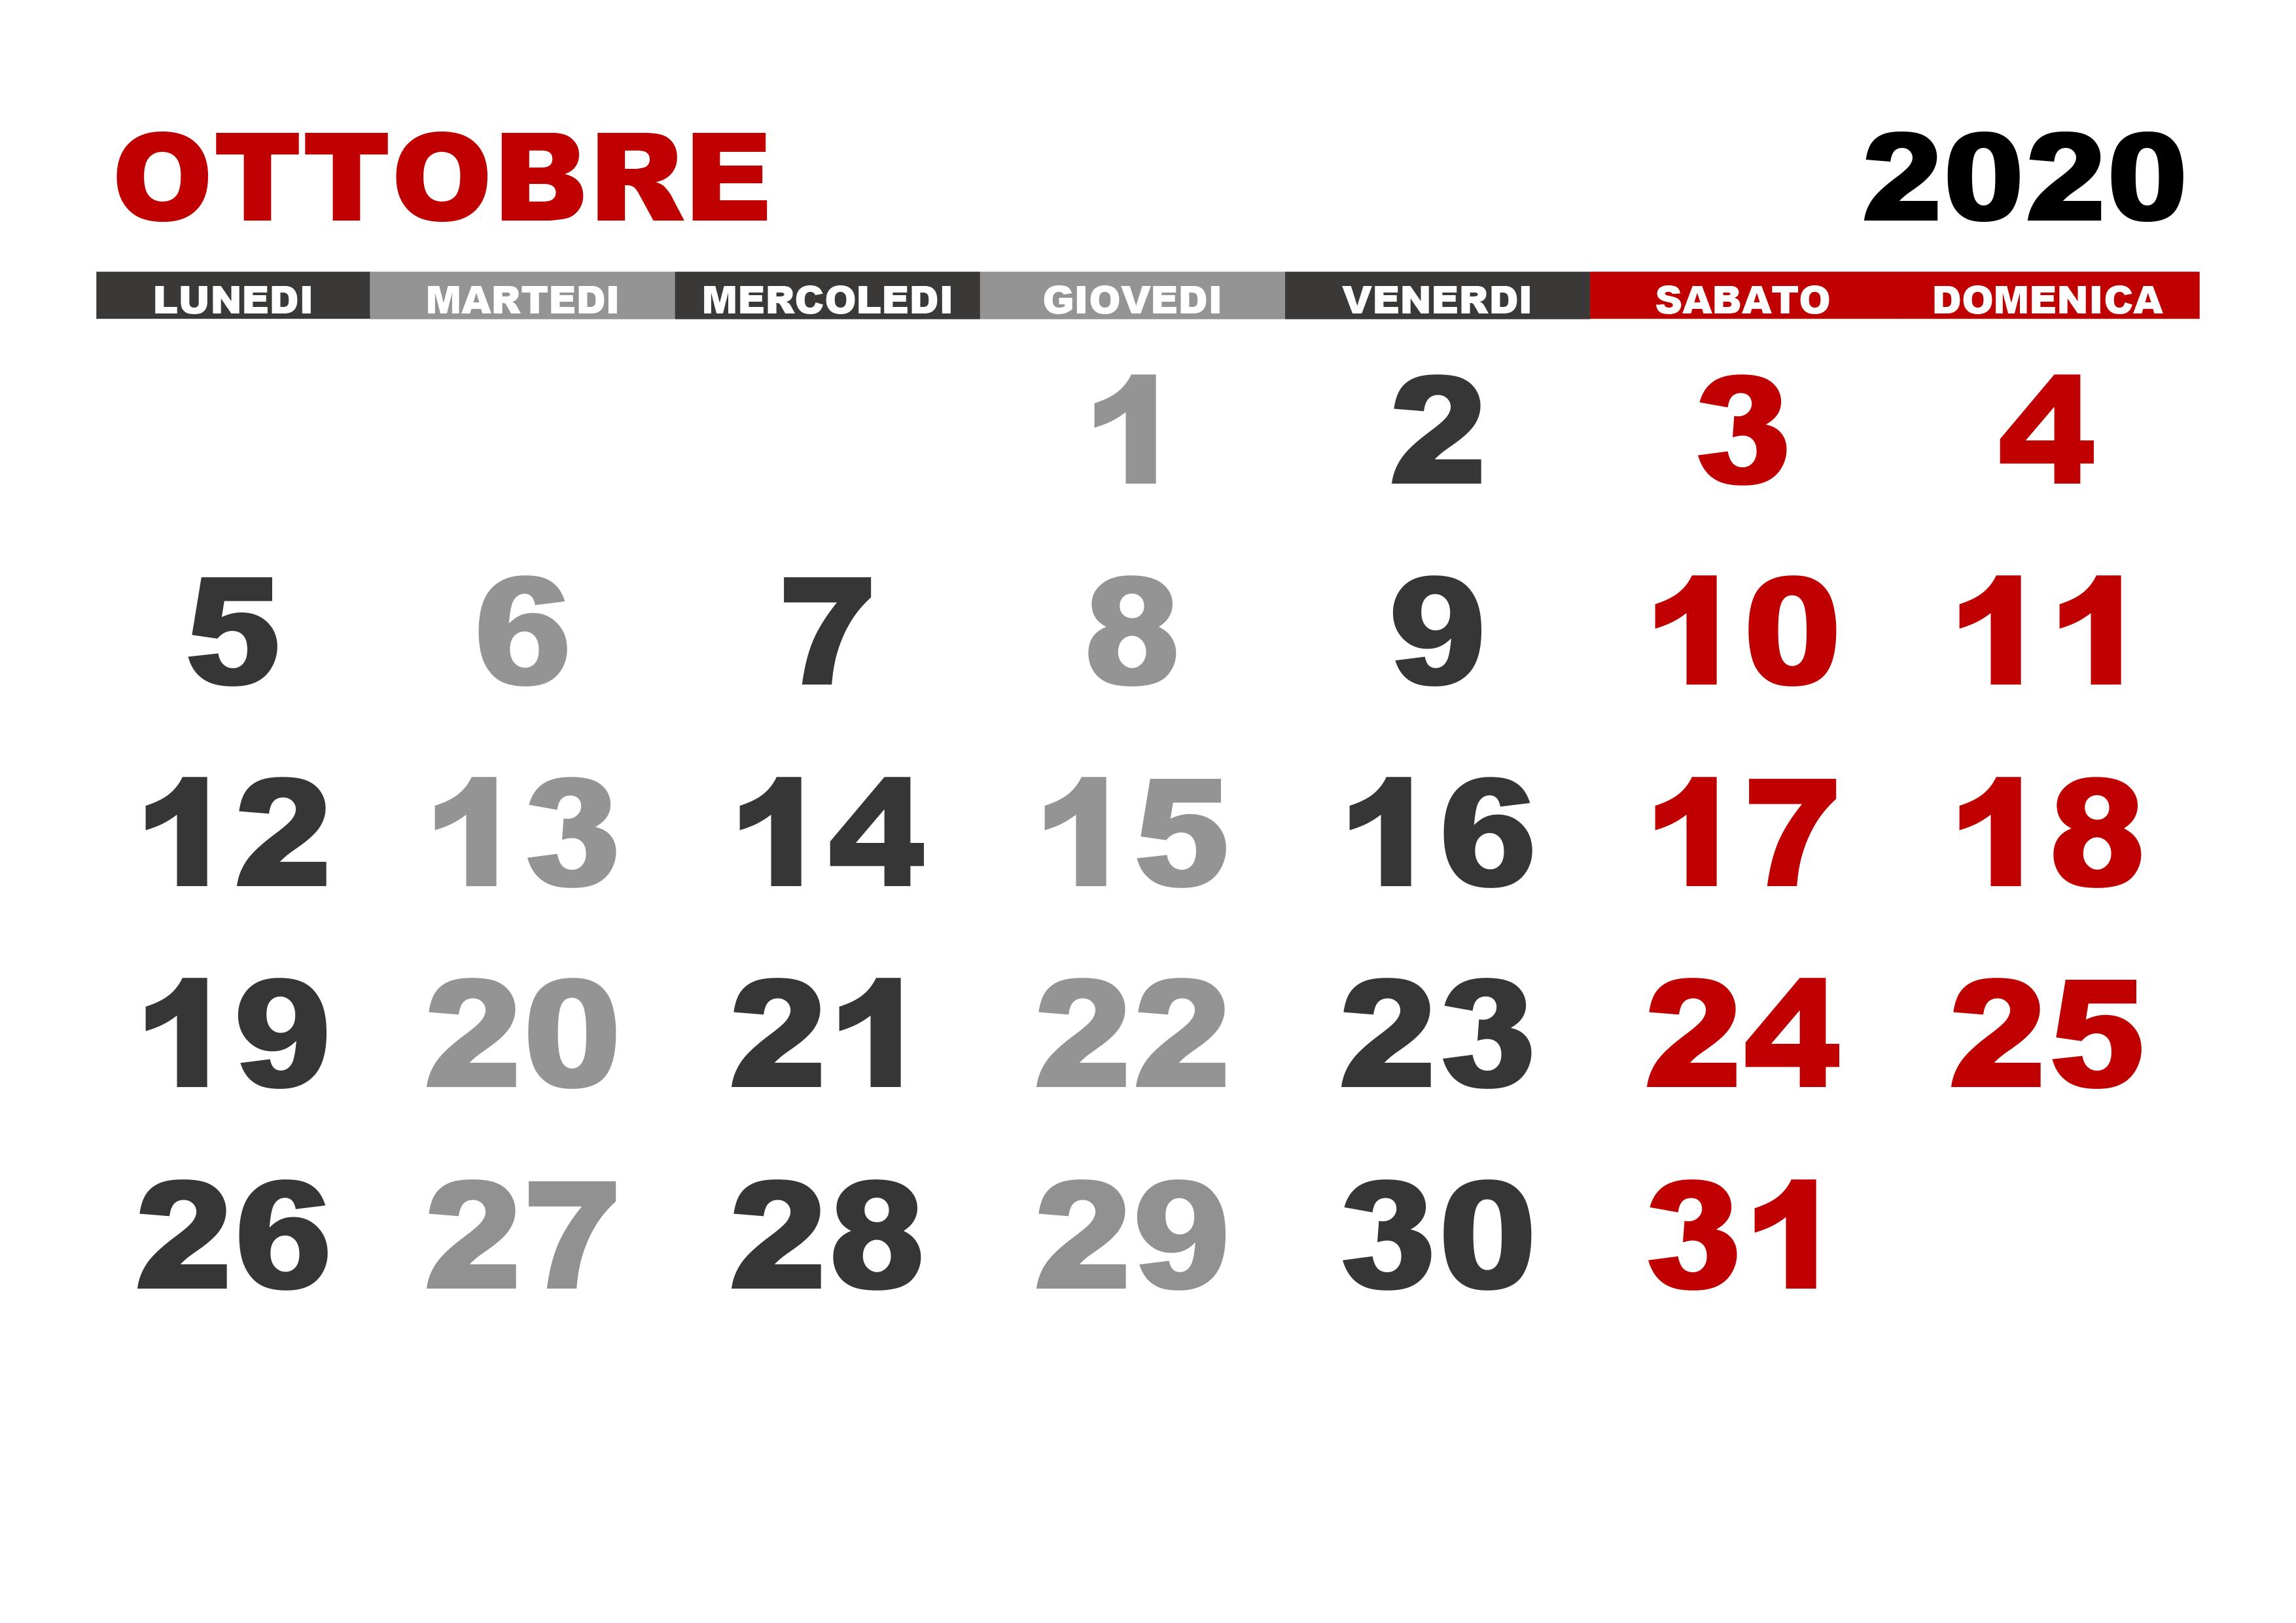 Calendario Mese Ottobre 2020.Calendario Ottobre 2020 Calendario Su